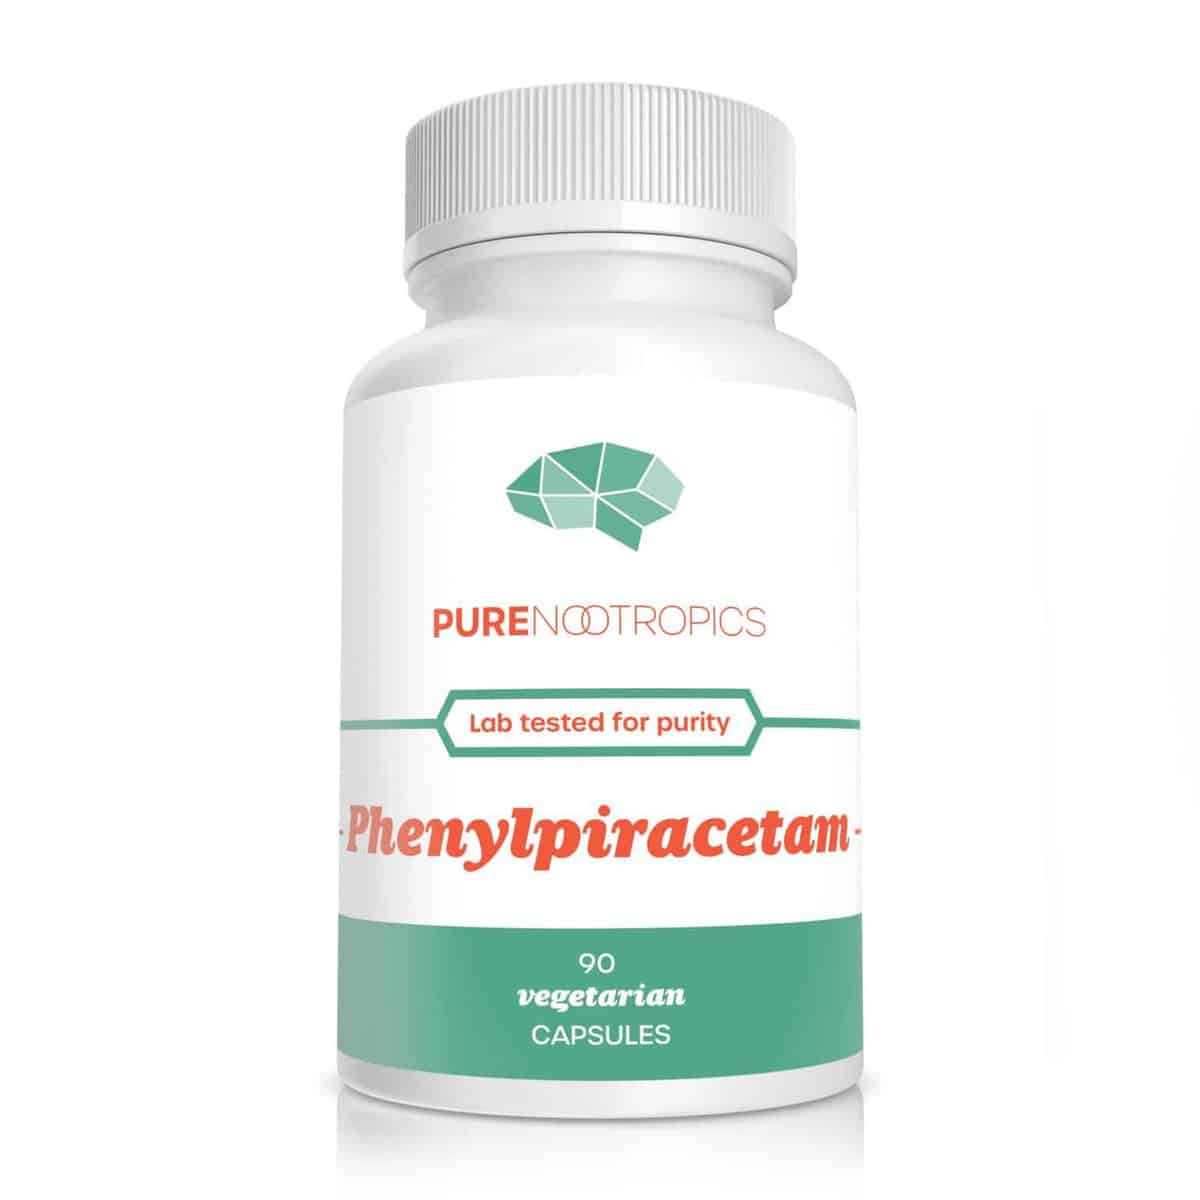 where to buy Phenylpiracetam, buy Phenylpiracetam from pure nootropics